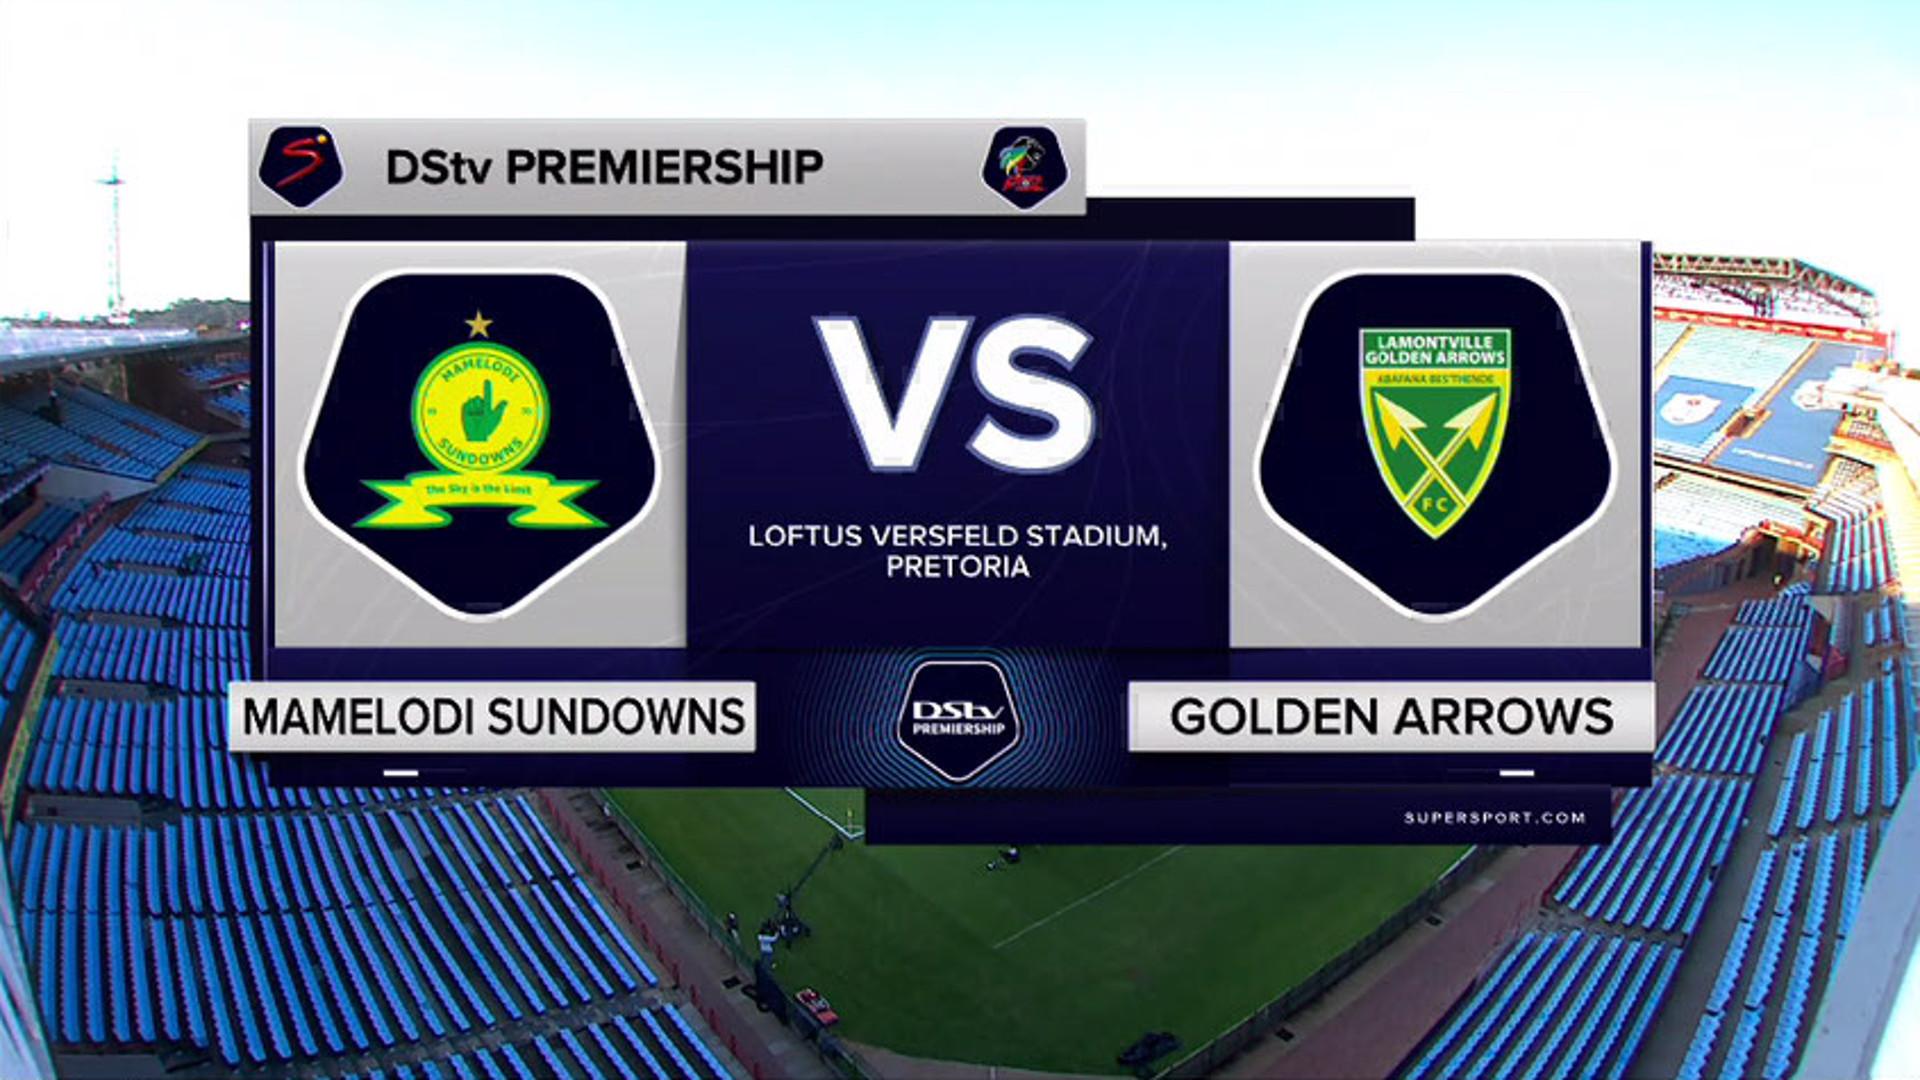 DStv Premiership l Mamelodi Sundowns v Golden Arrows l Highlights